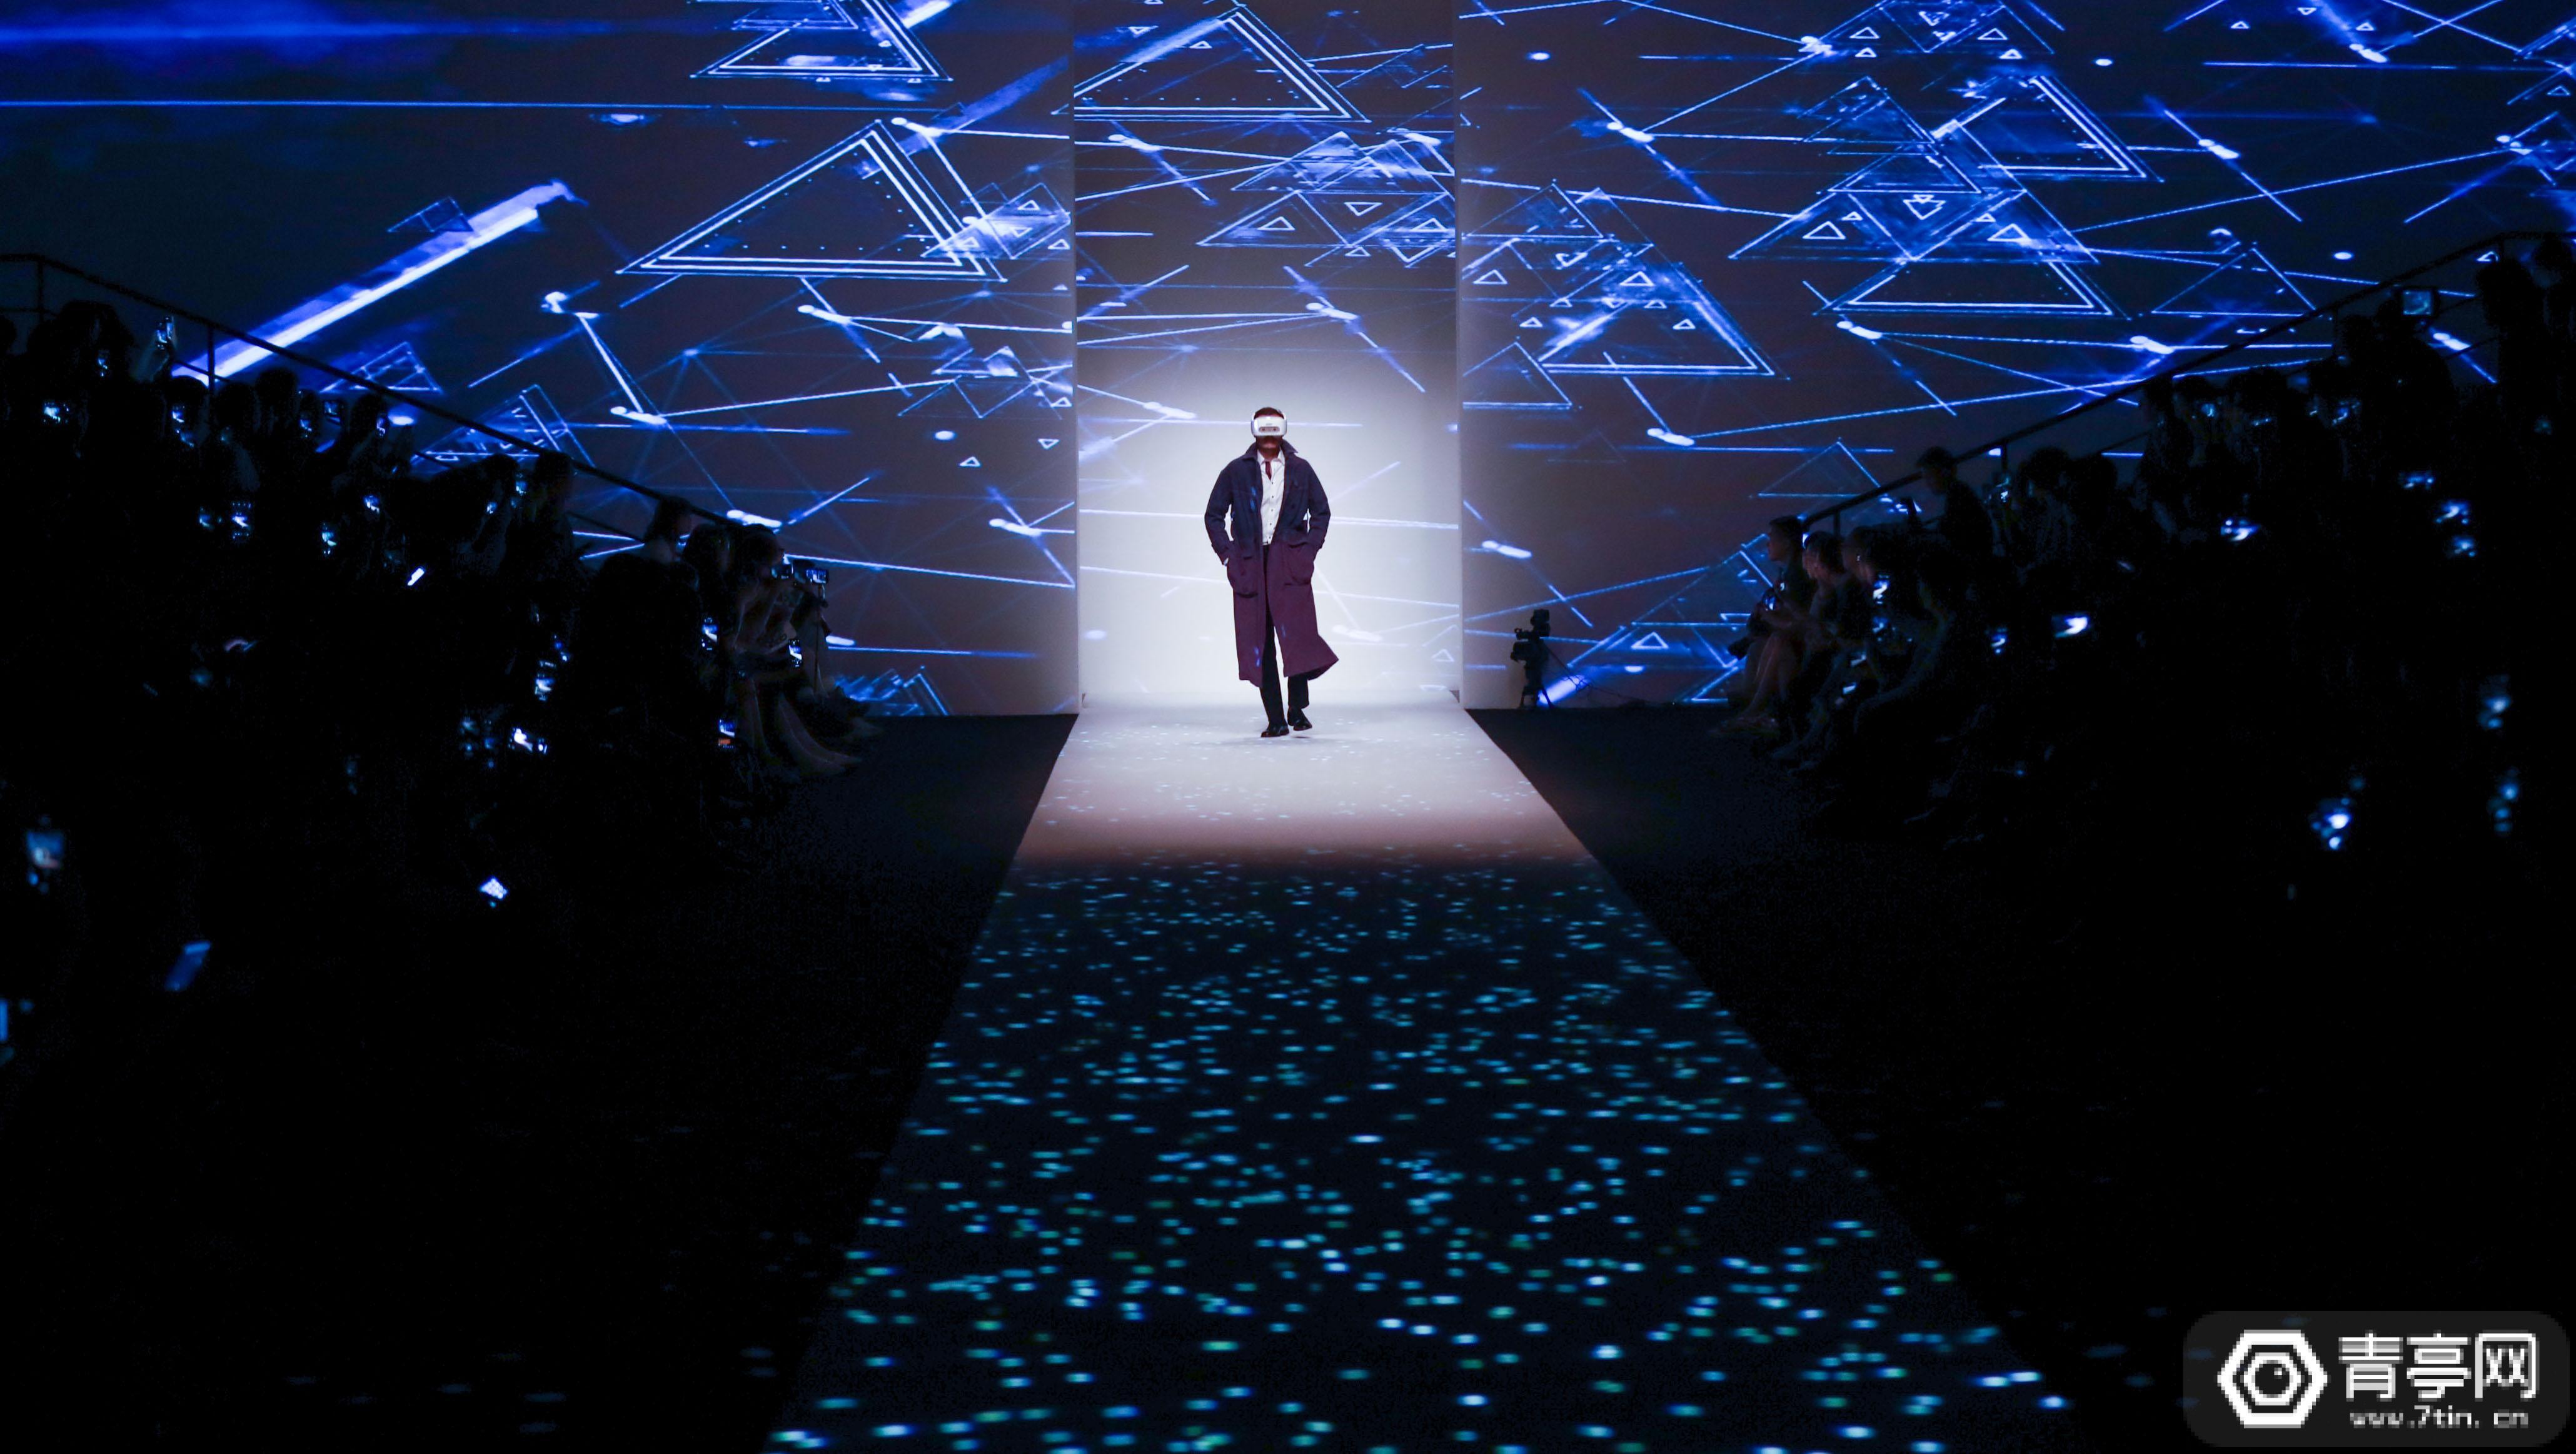 VR跨界时尚,HTC VIVE亮相上海时装周,首次实现VR走秀